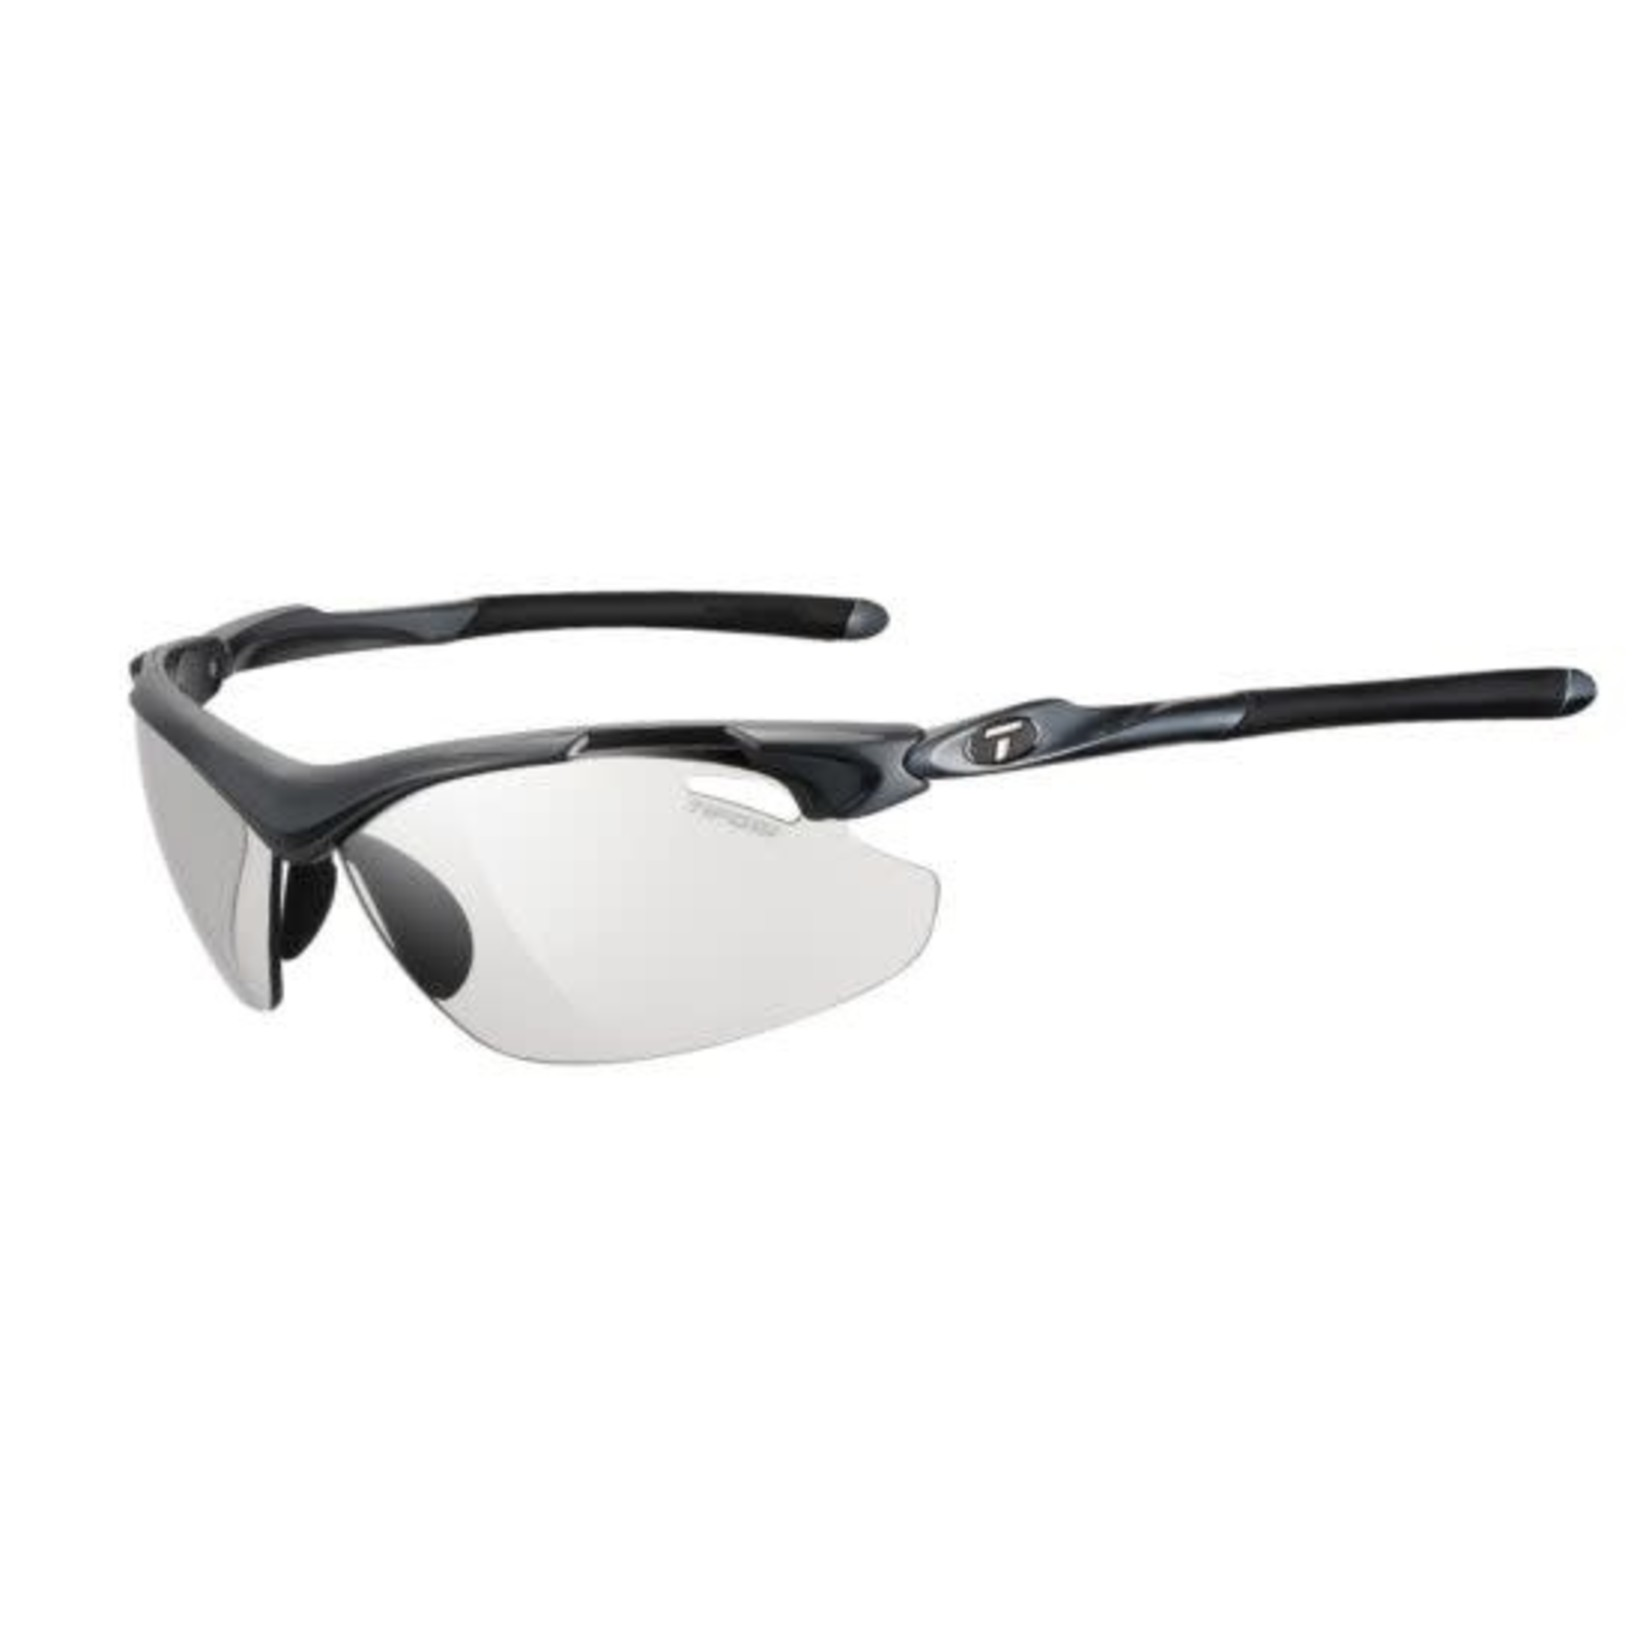 Tifosi Optics Tyrant 2.0, Gunmetal Fototec Sunglasses